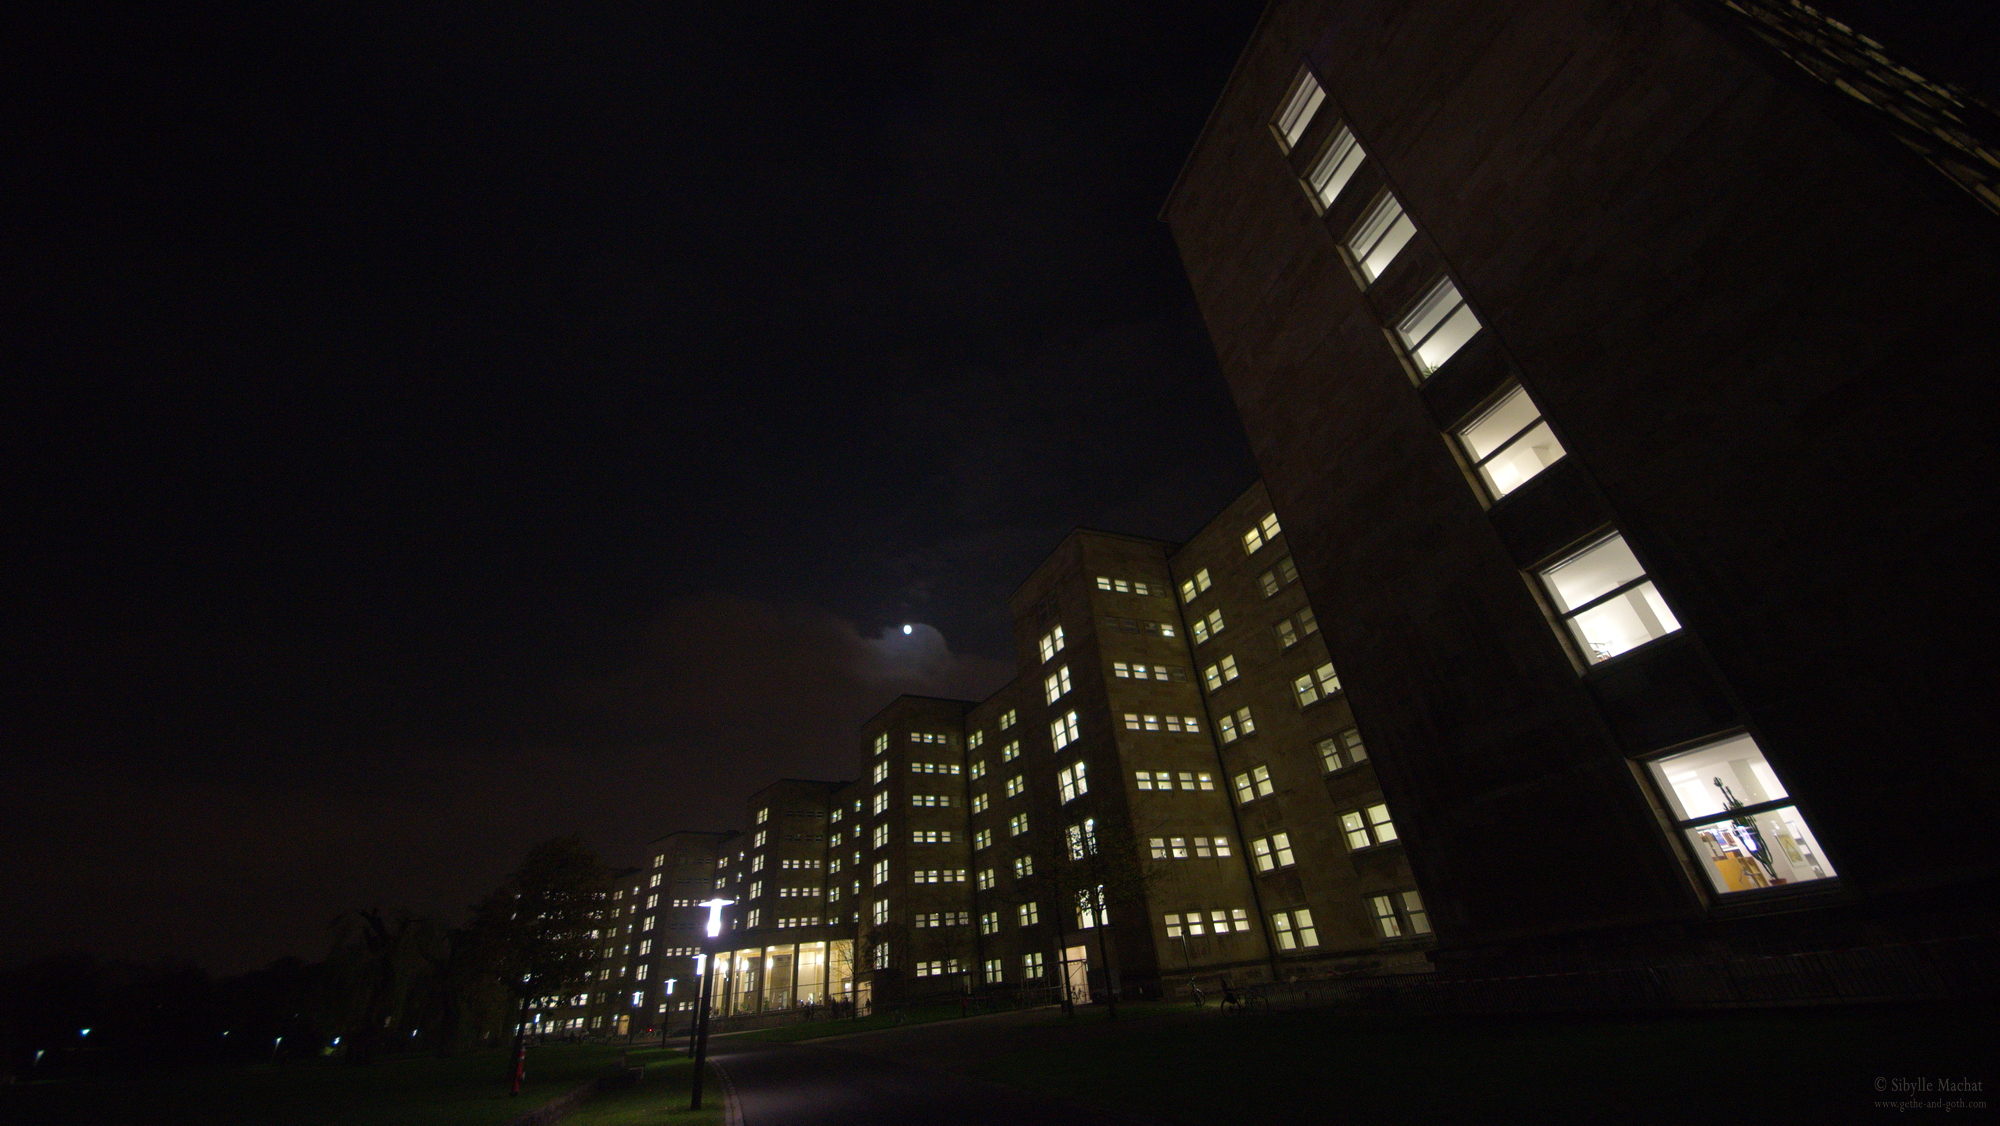 Universität Frankfurt, falling lines